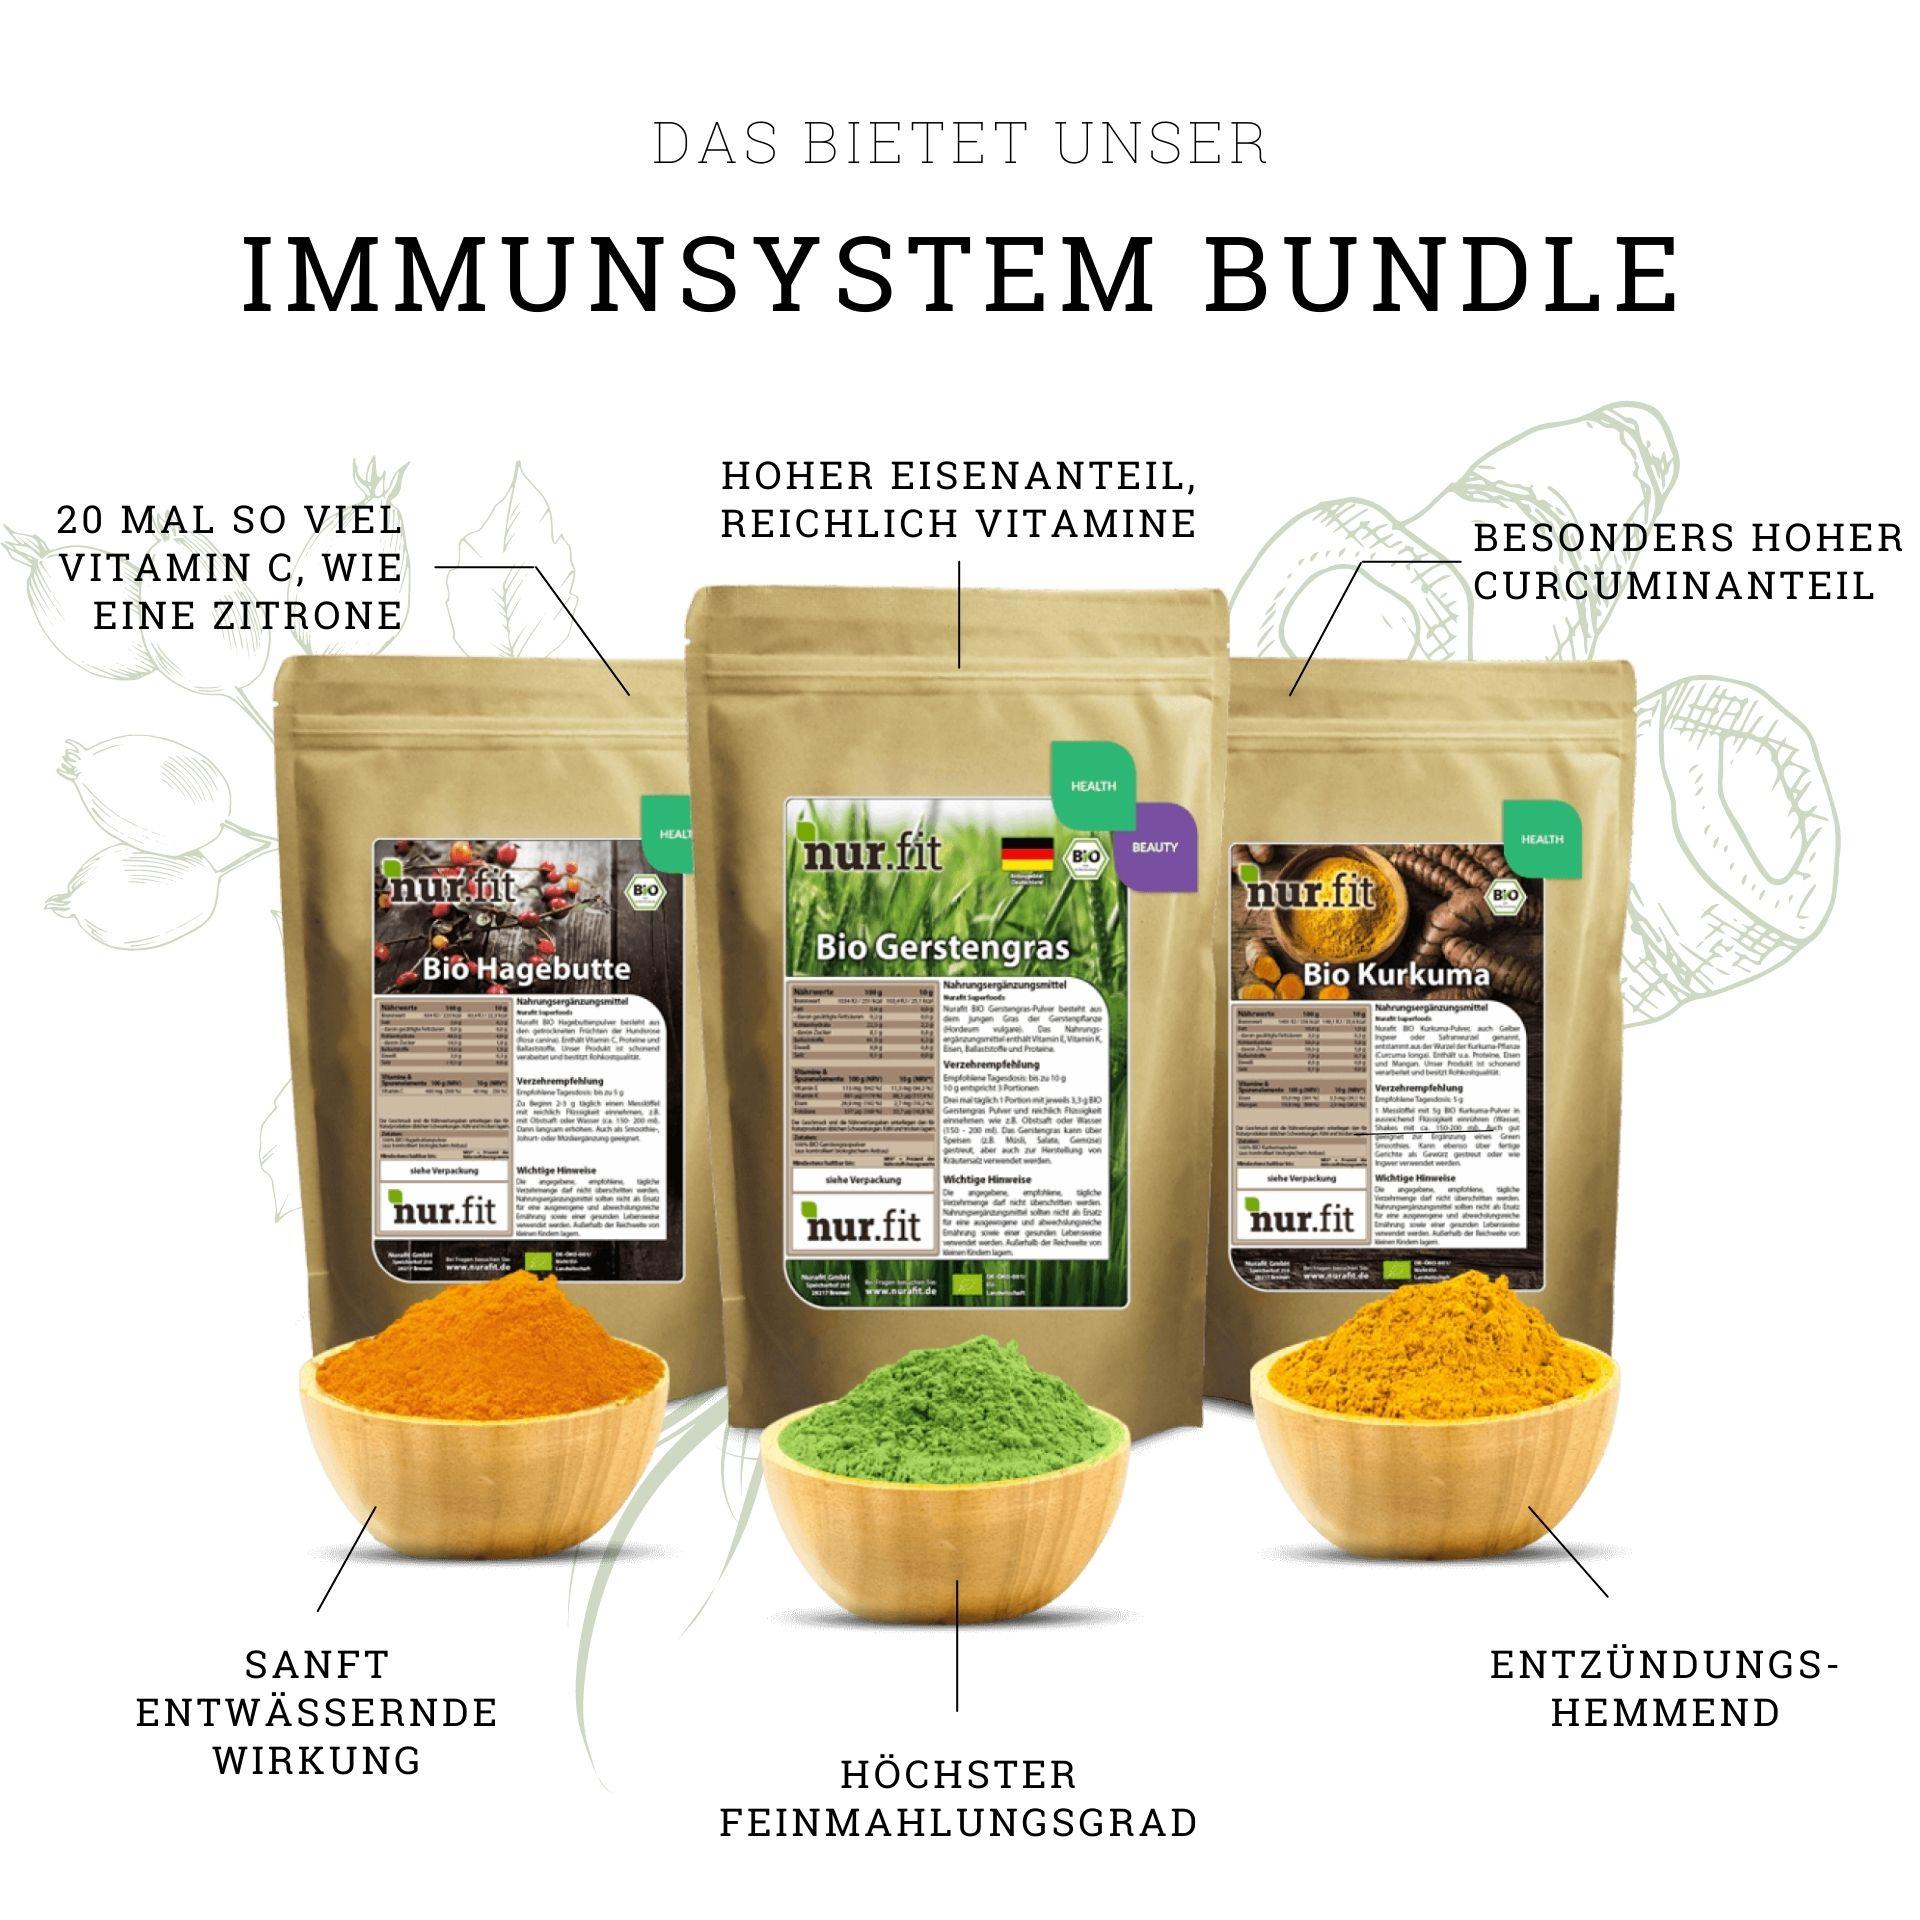 Immune System Bundle